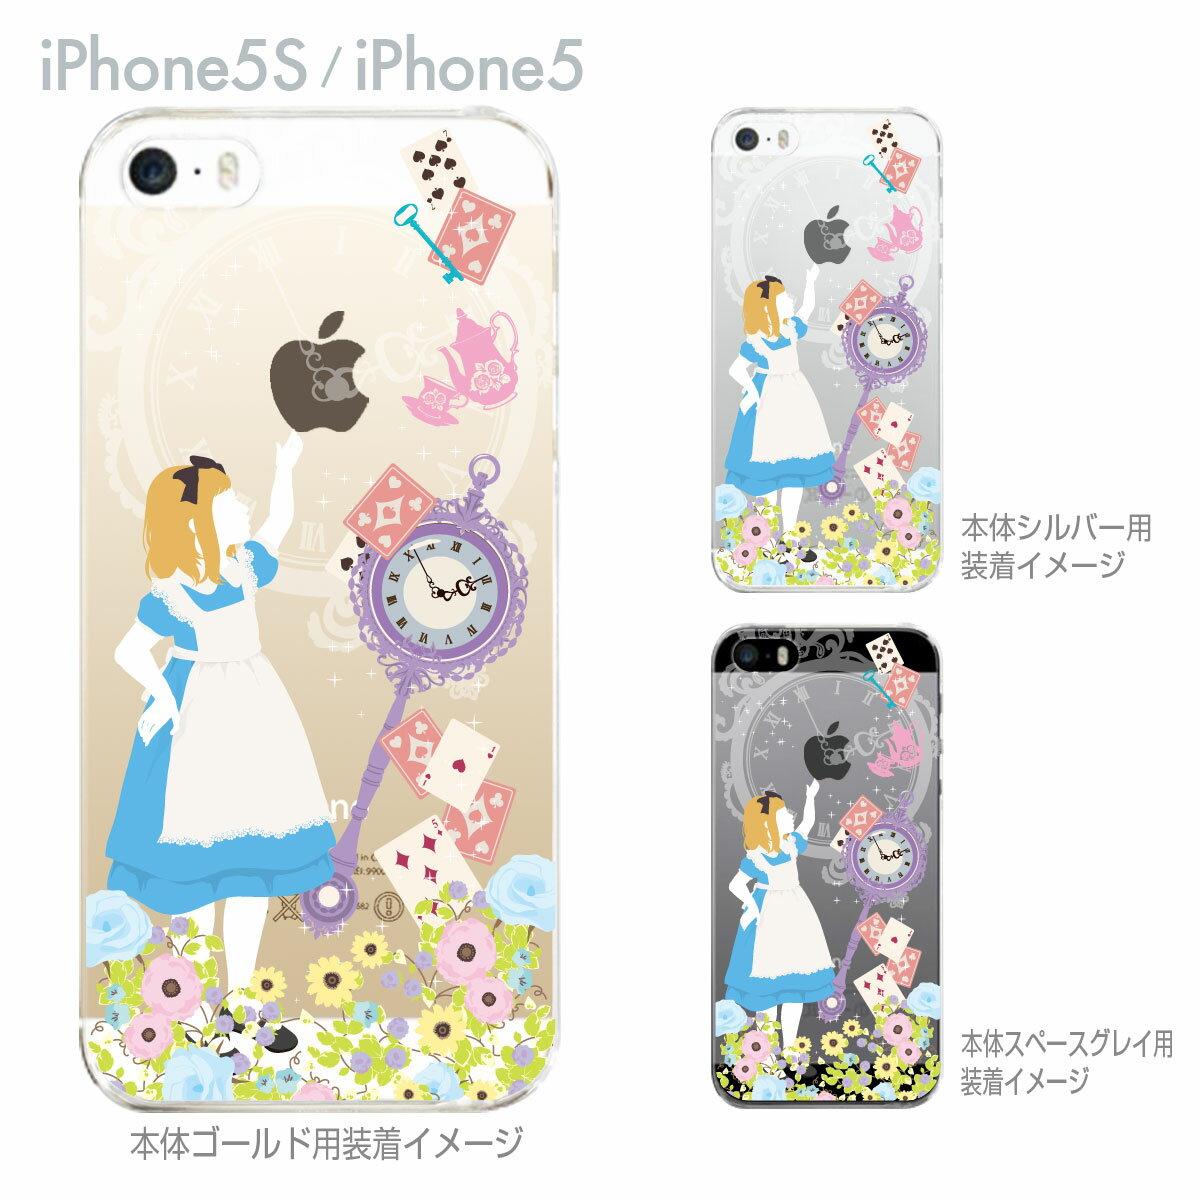 【iPhone5S】【iPhone5】【iPhone5sケース】【iPhone5ケース】【カバー】【スマホケース】【クリアケース】【クリアーアーツ】【少女】 09-ip5s-fp0001